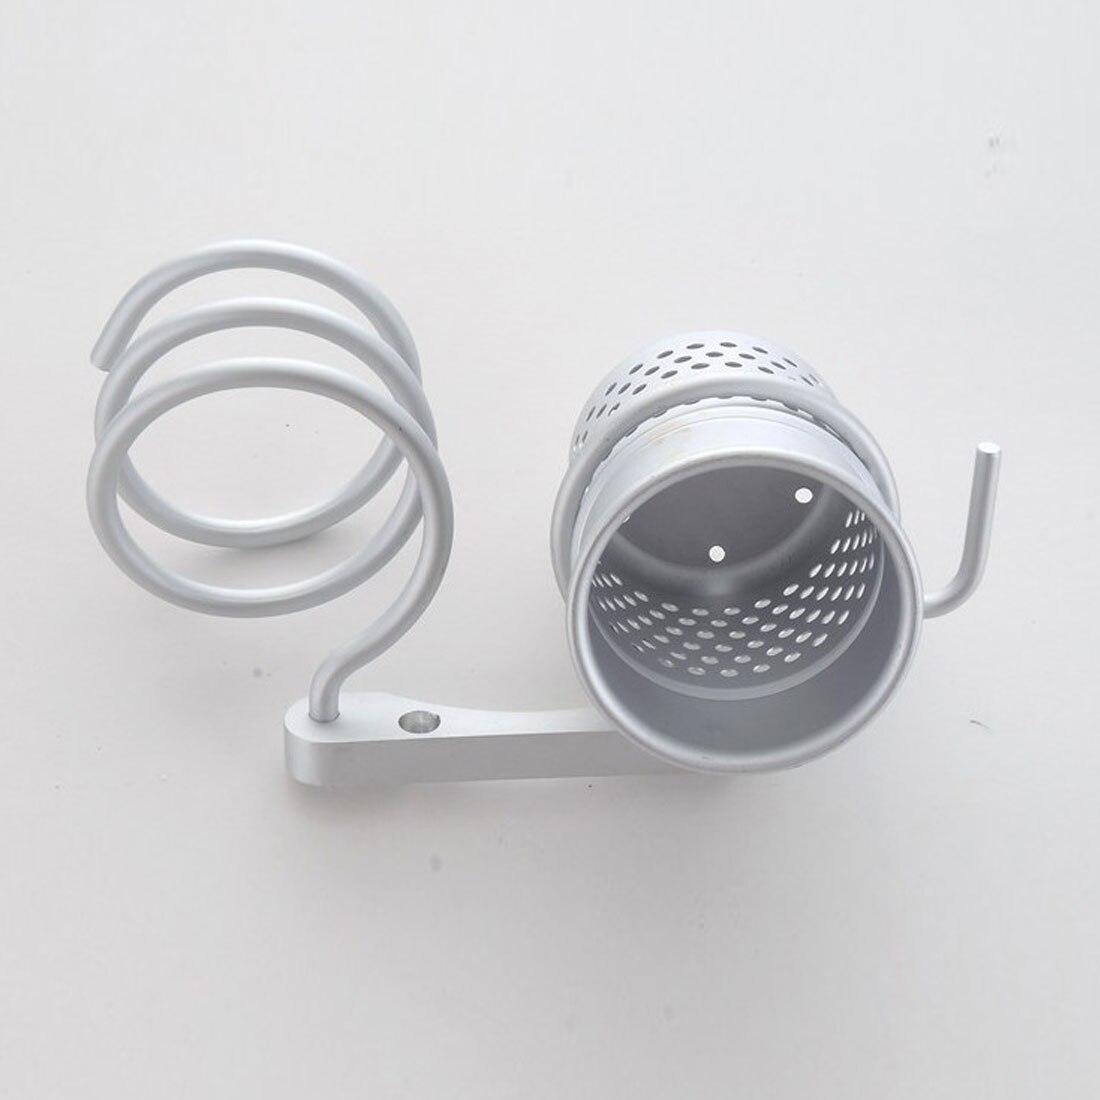 Badezimmer Regale Innovative Wand Haar Trockner Metall Bad Regal Lagerung Haartrockner Halter Für Haartrockner